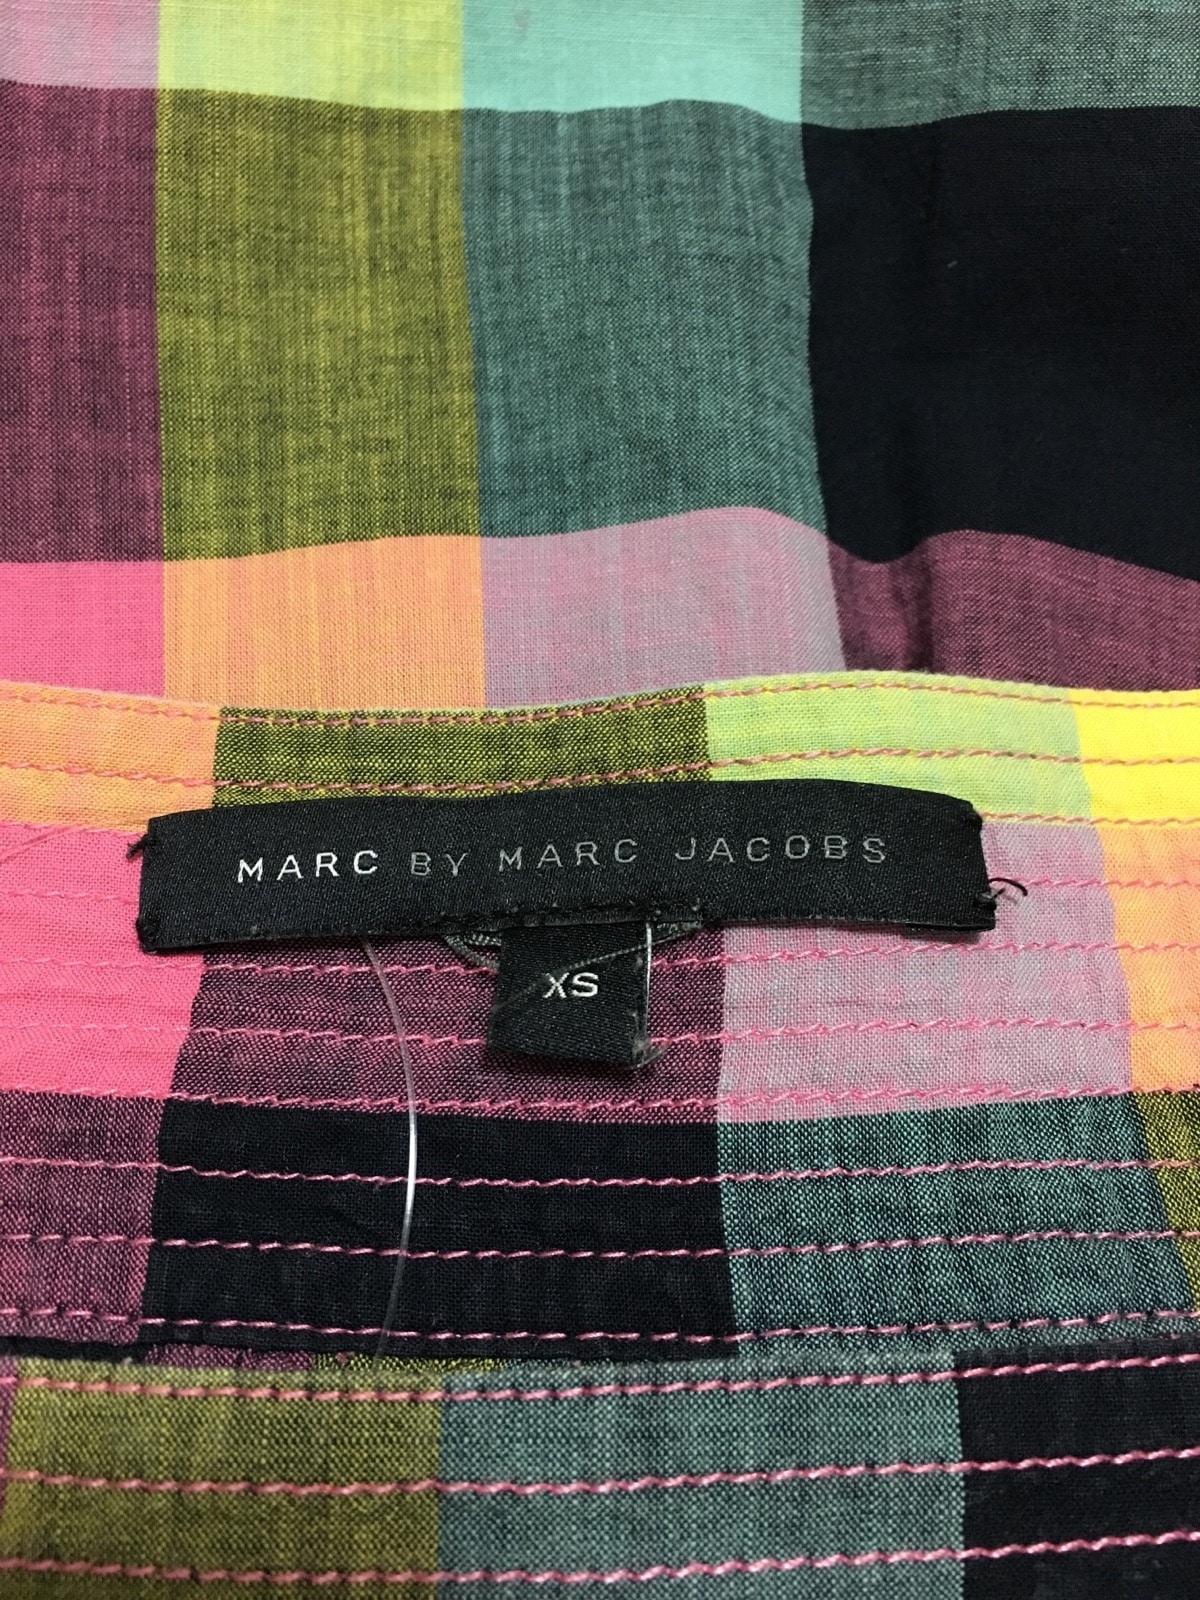 MARC BY MARC JACOBS(マークバイマークジェイコブス)のチュニック